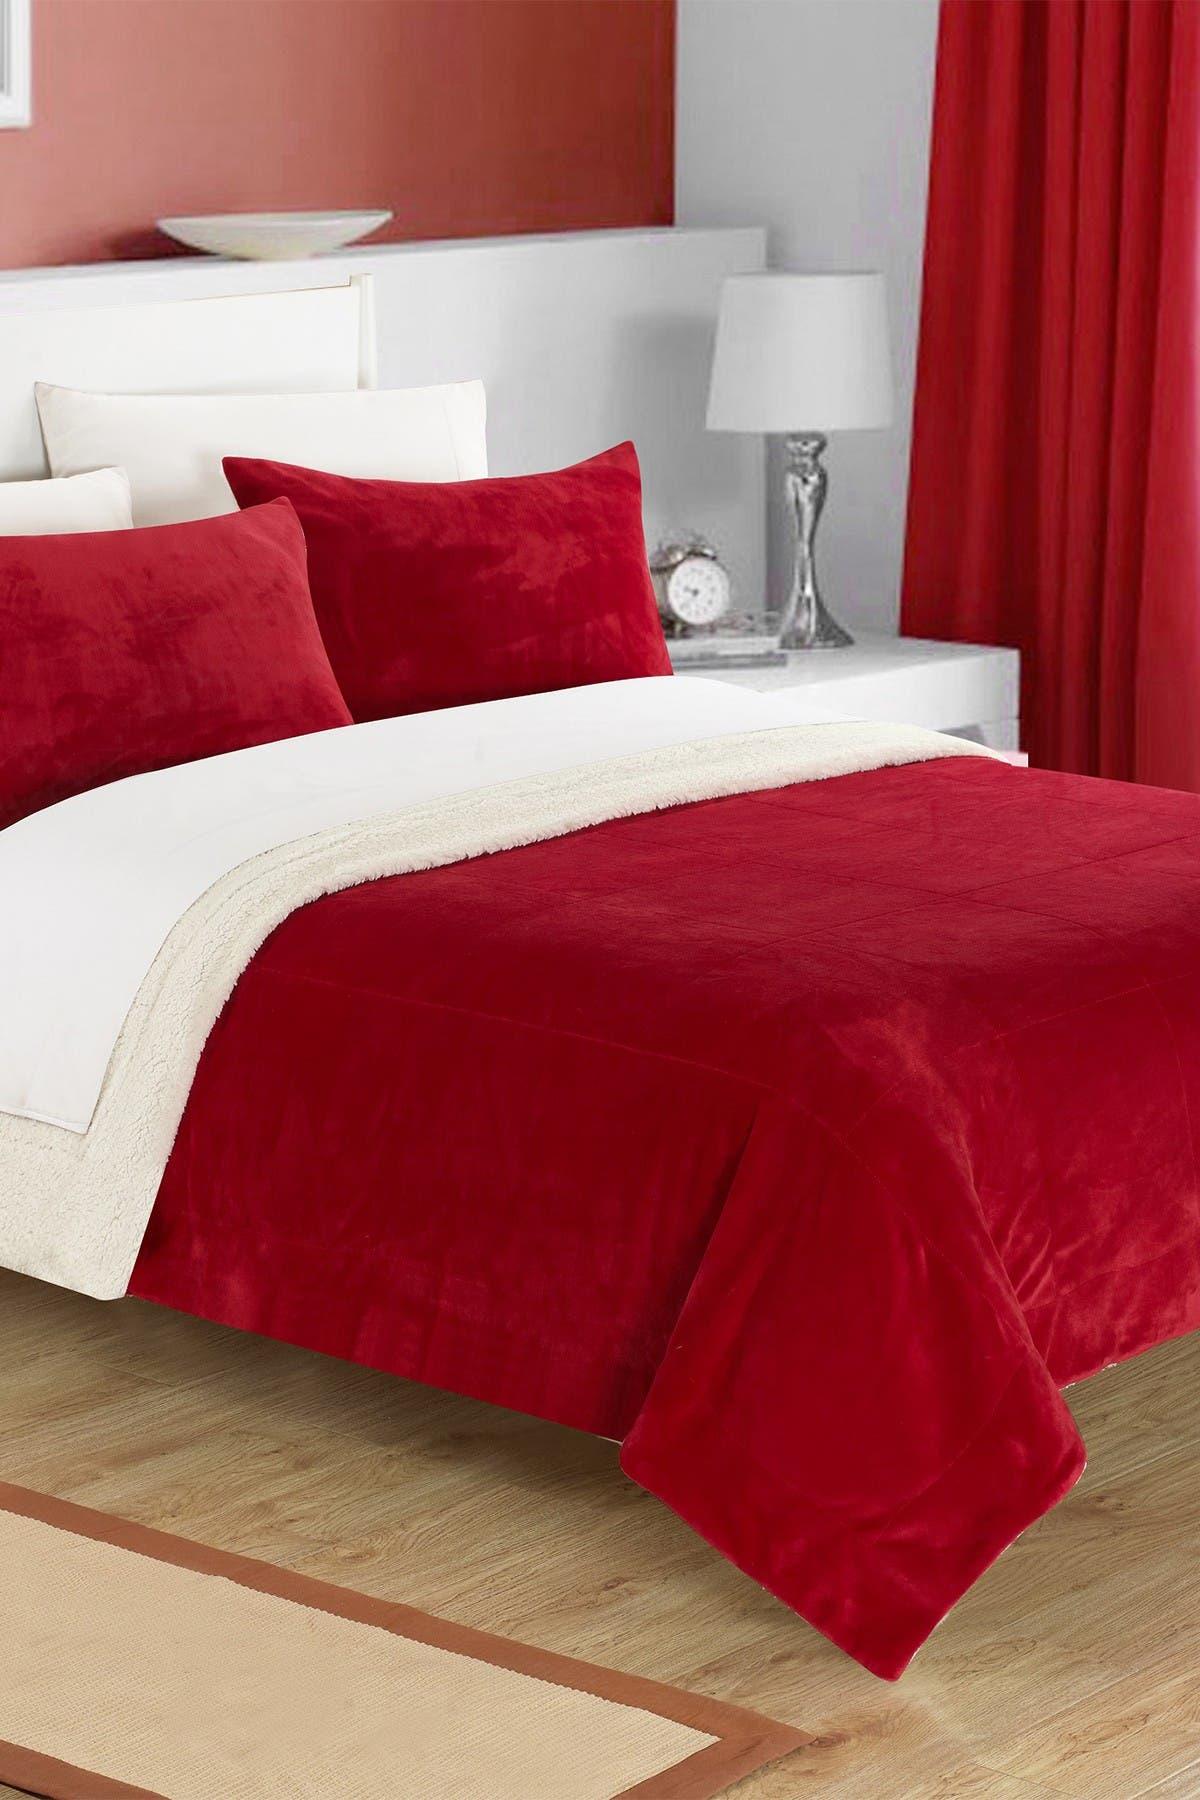 Image of Chic Home Bedding King Evelyn Shearling Blanket Set - Burgundy